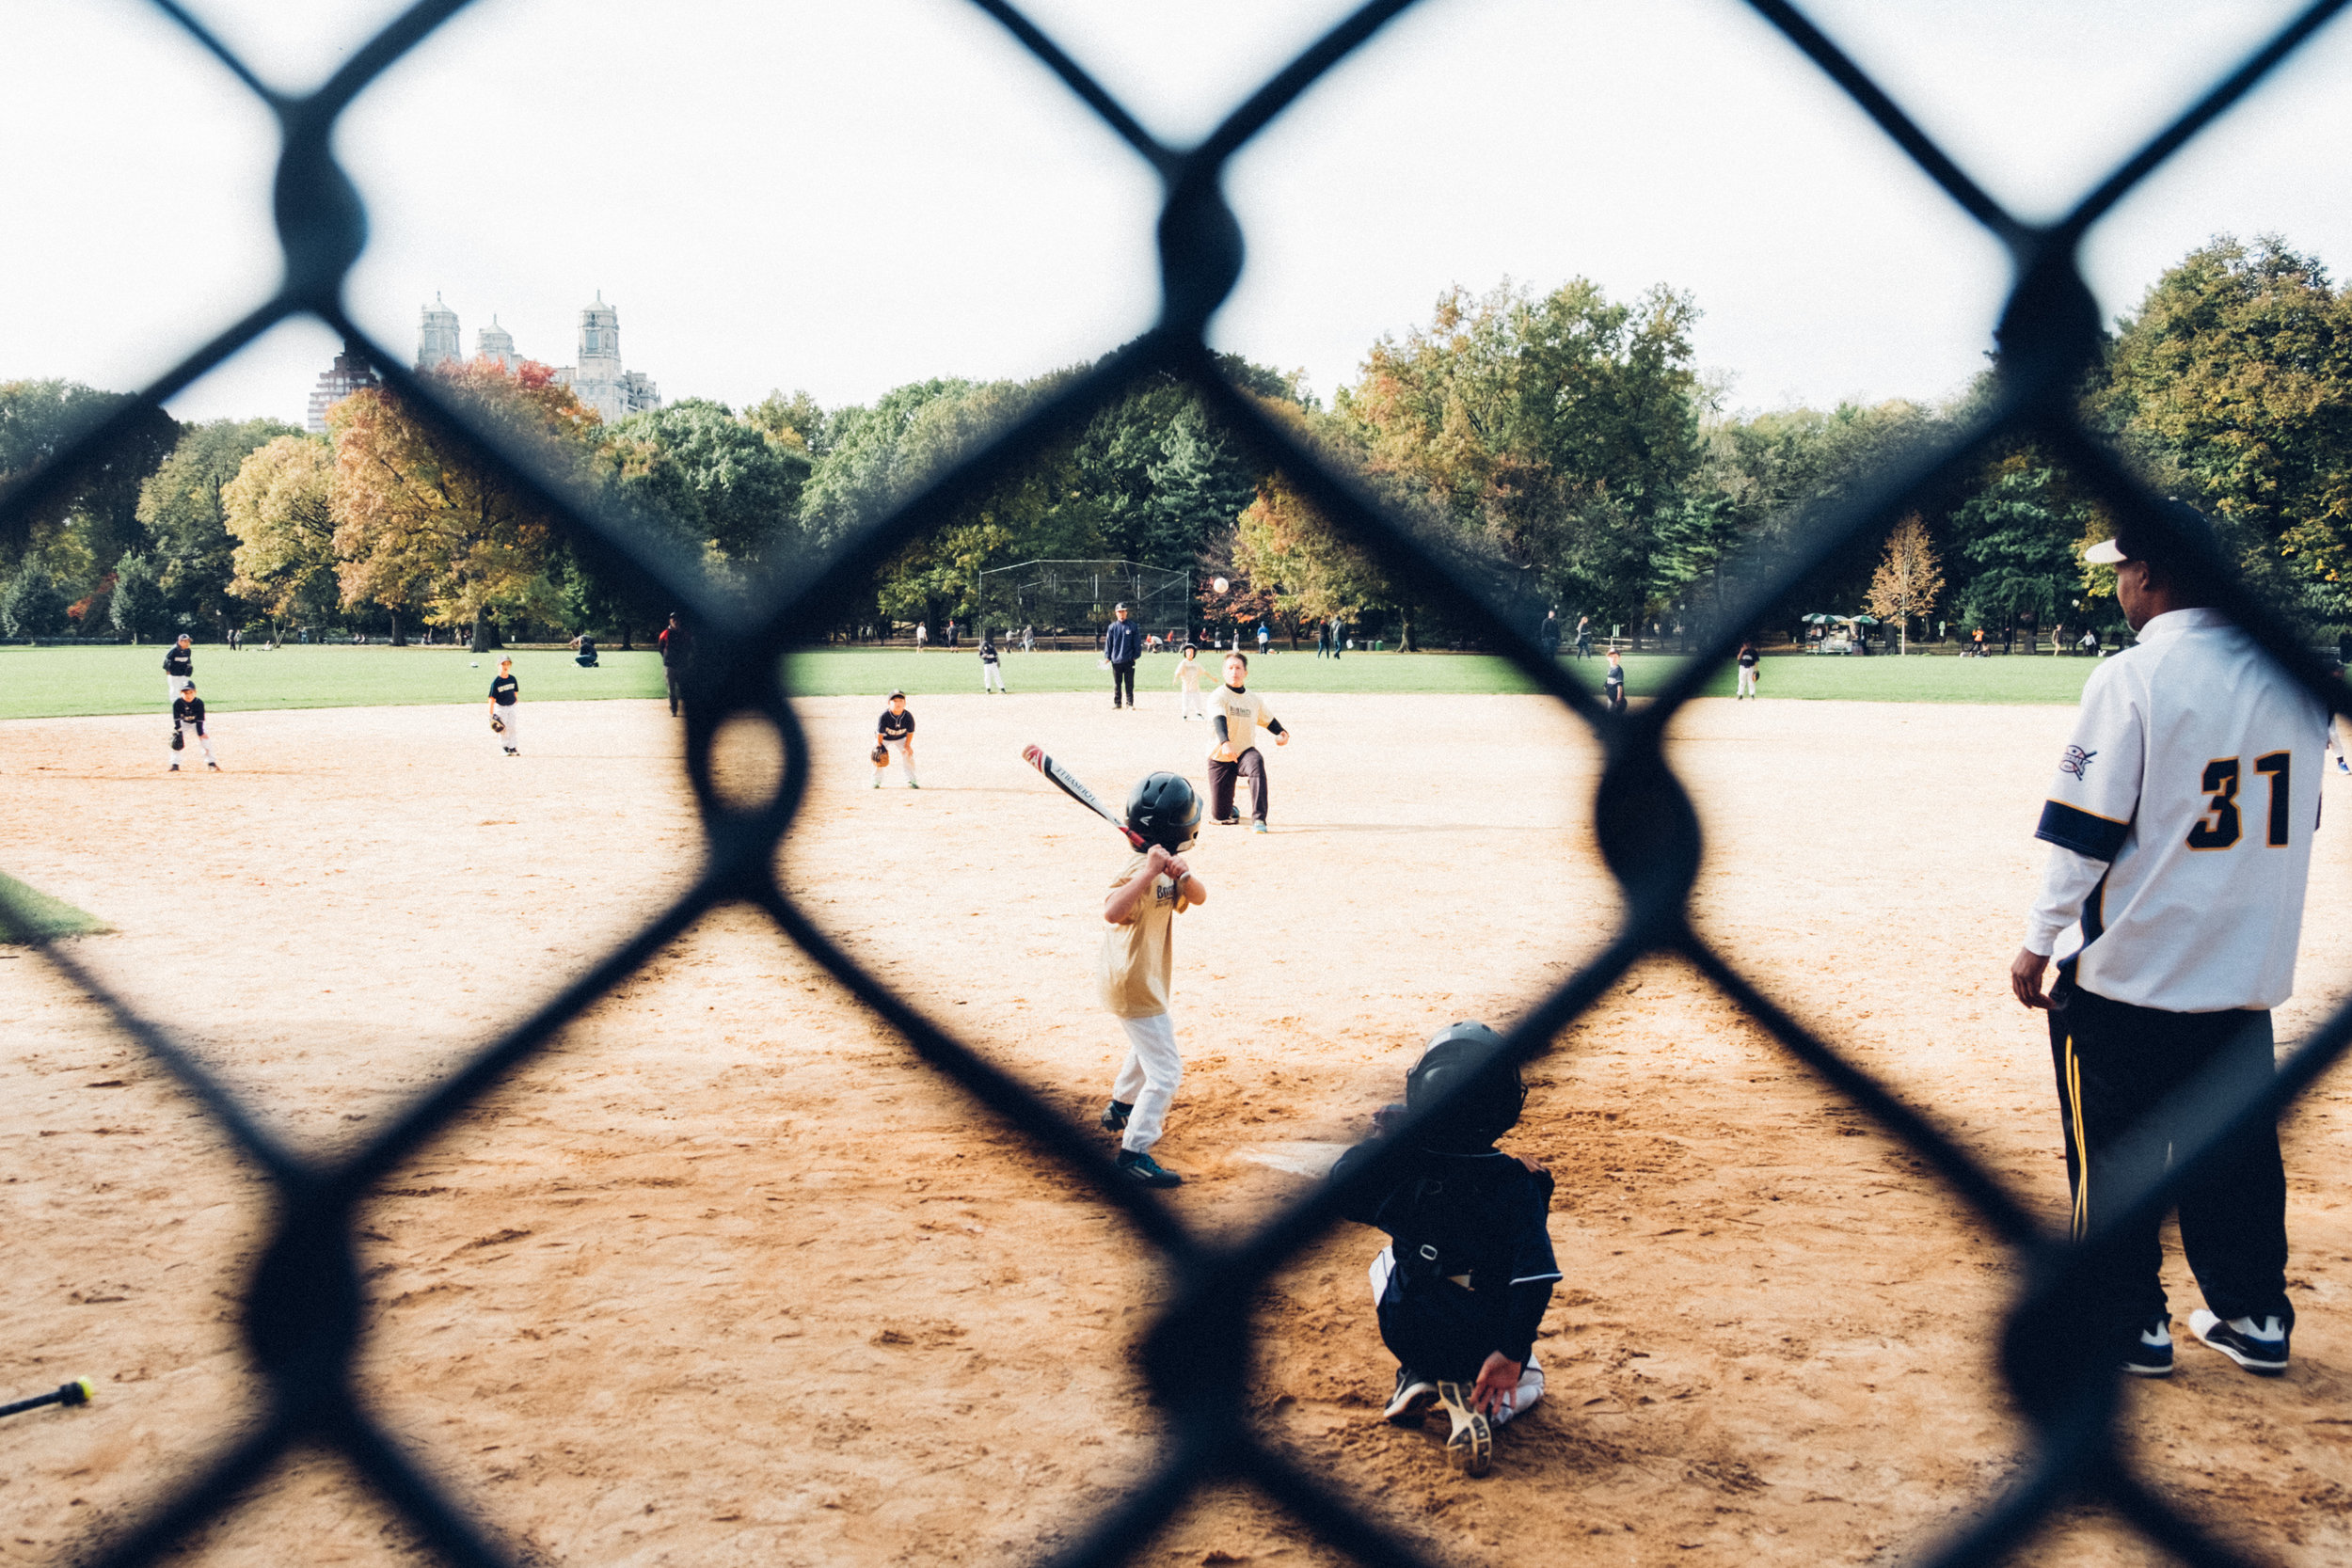 Sunday Game, Central Park, New York